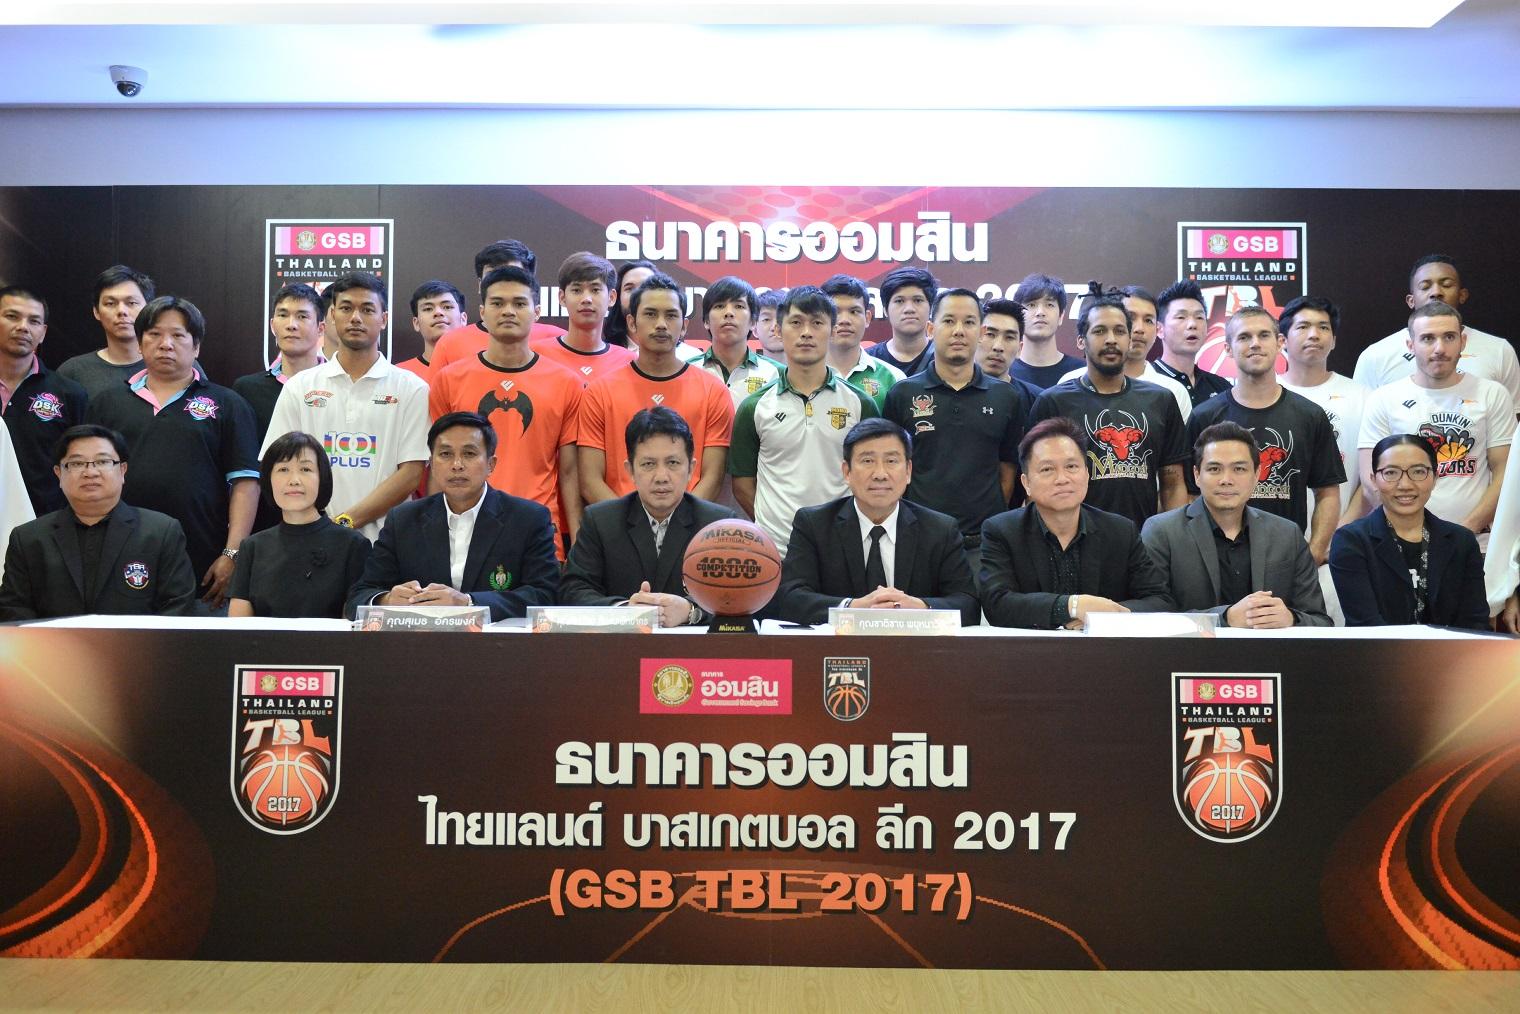 GSB TBL 2017 Press Conference